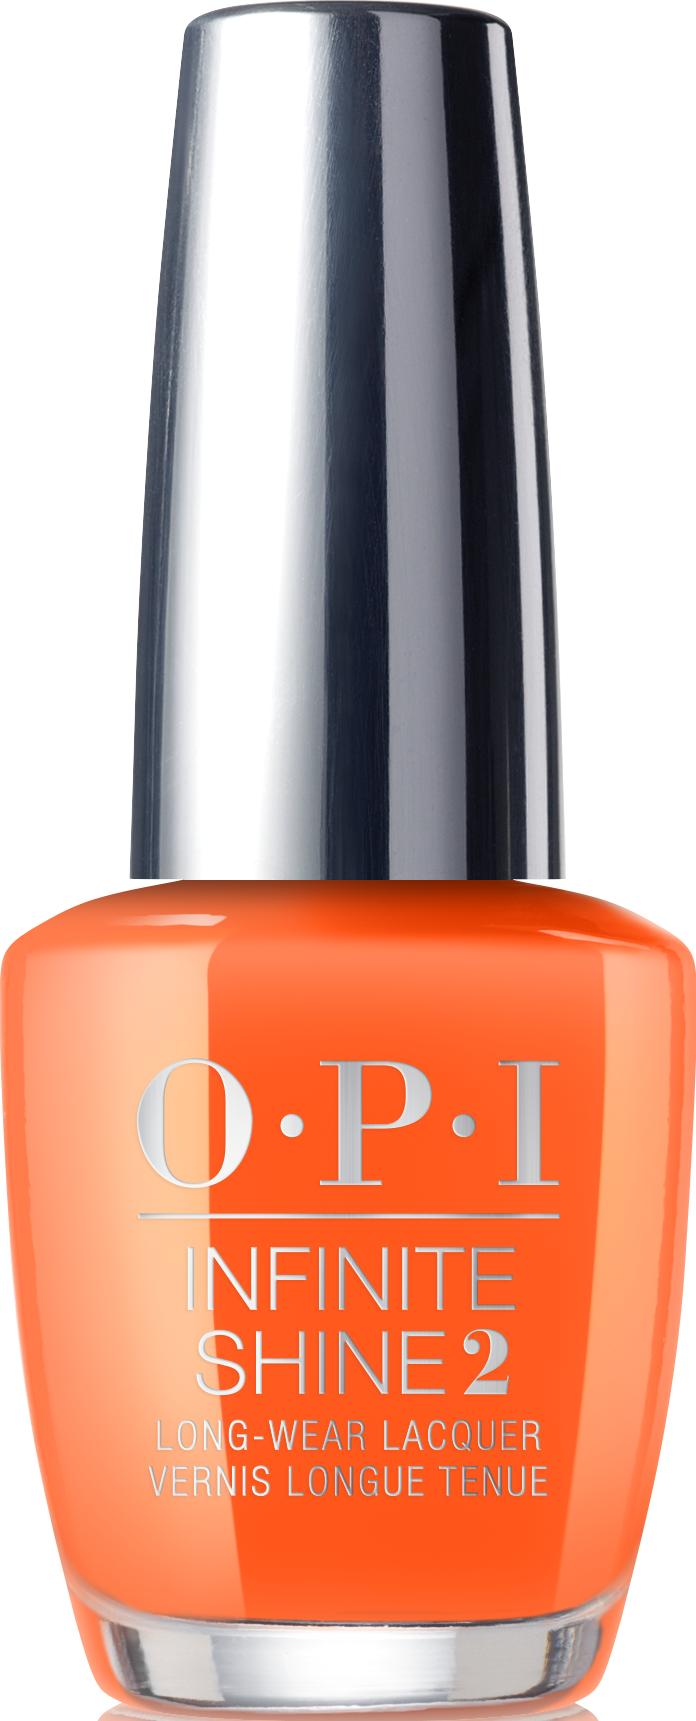 Opi Infinite Shine You Can Count On It Opi Infinite Shine Tempura Ture Is Rising Islt89 Opi Nail Polish Perfect Peach